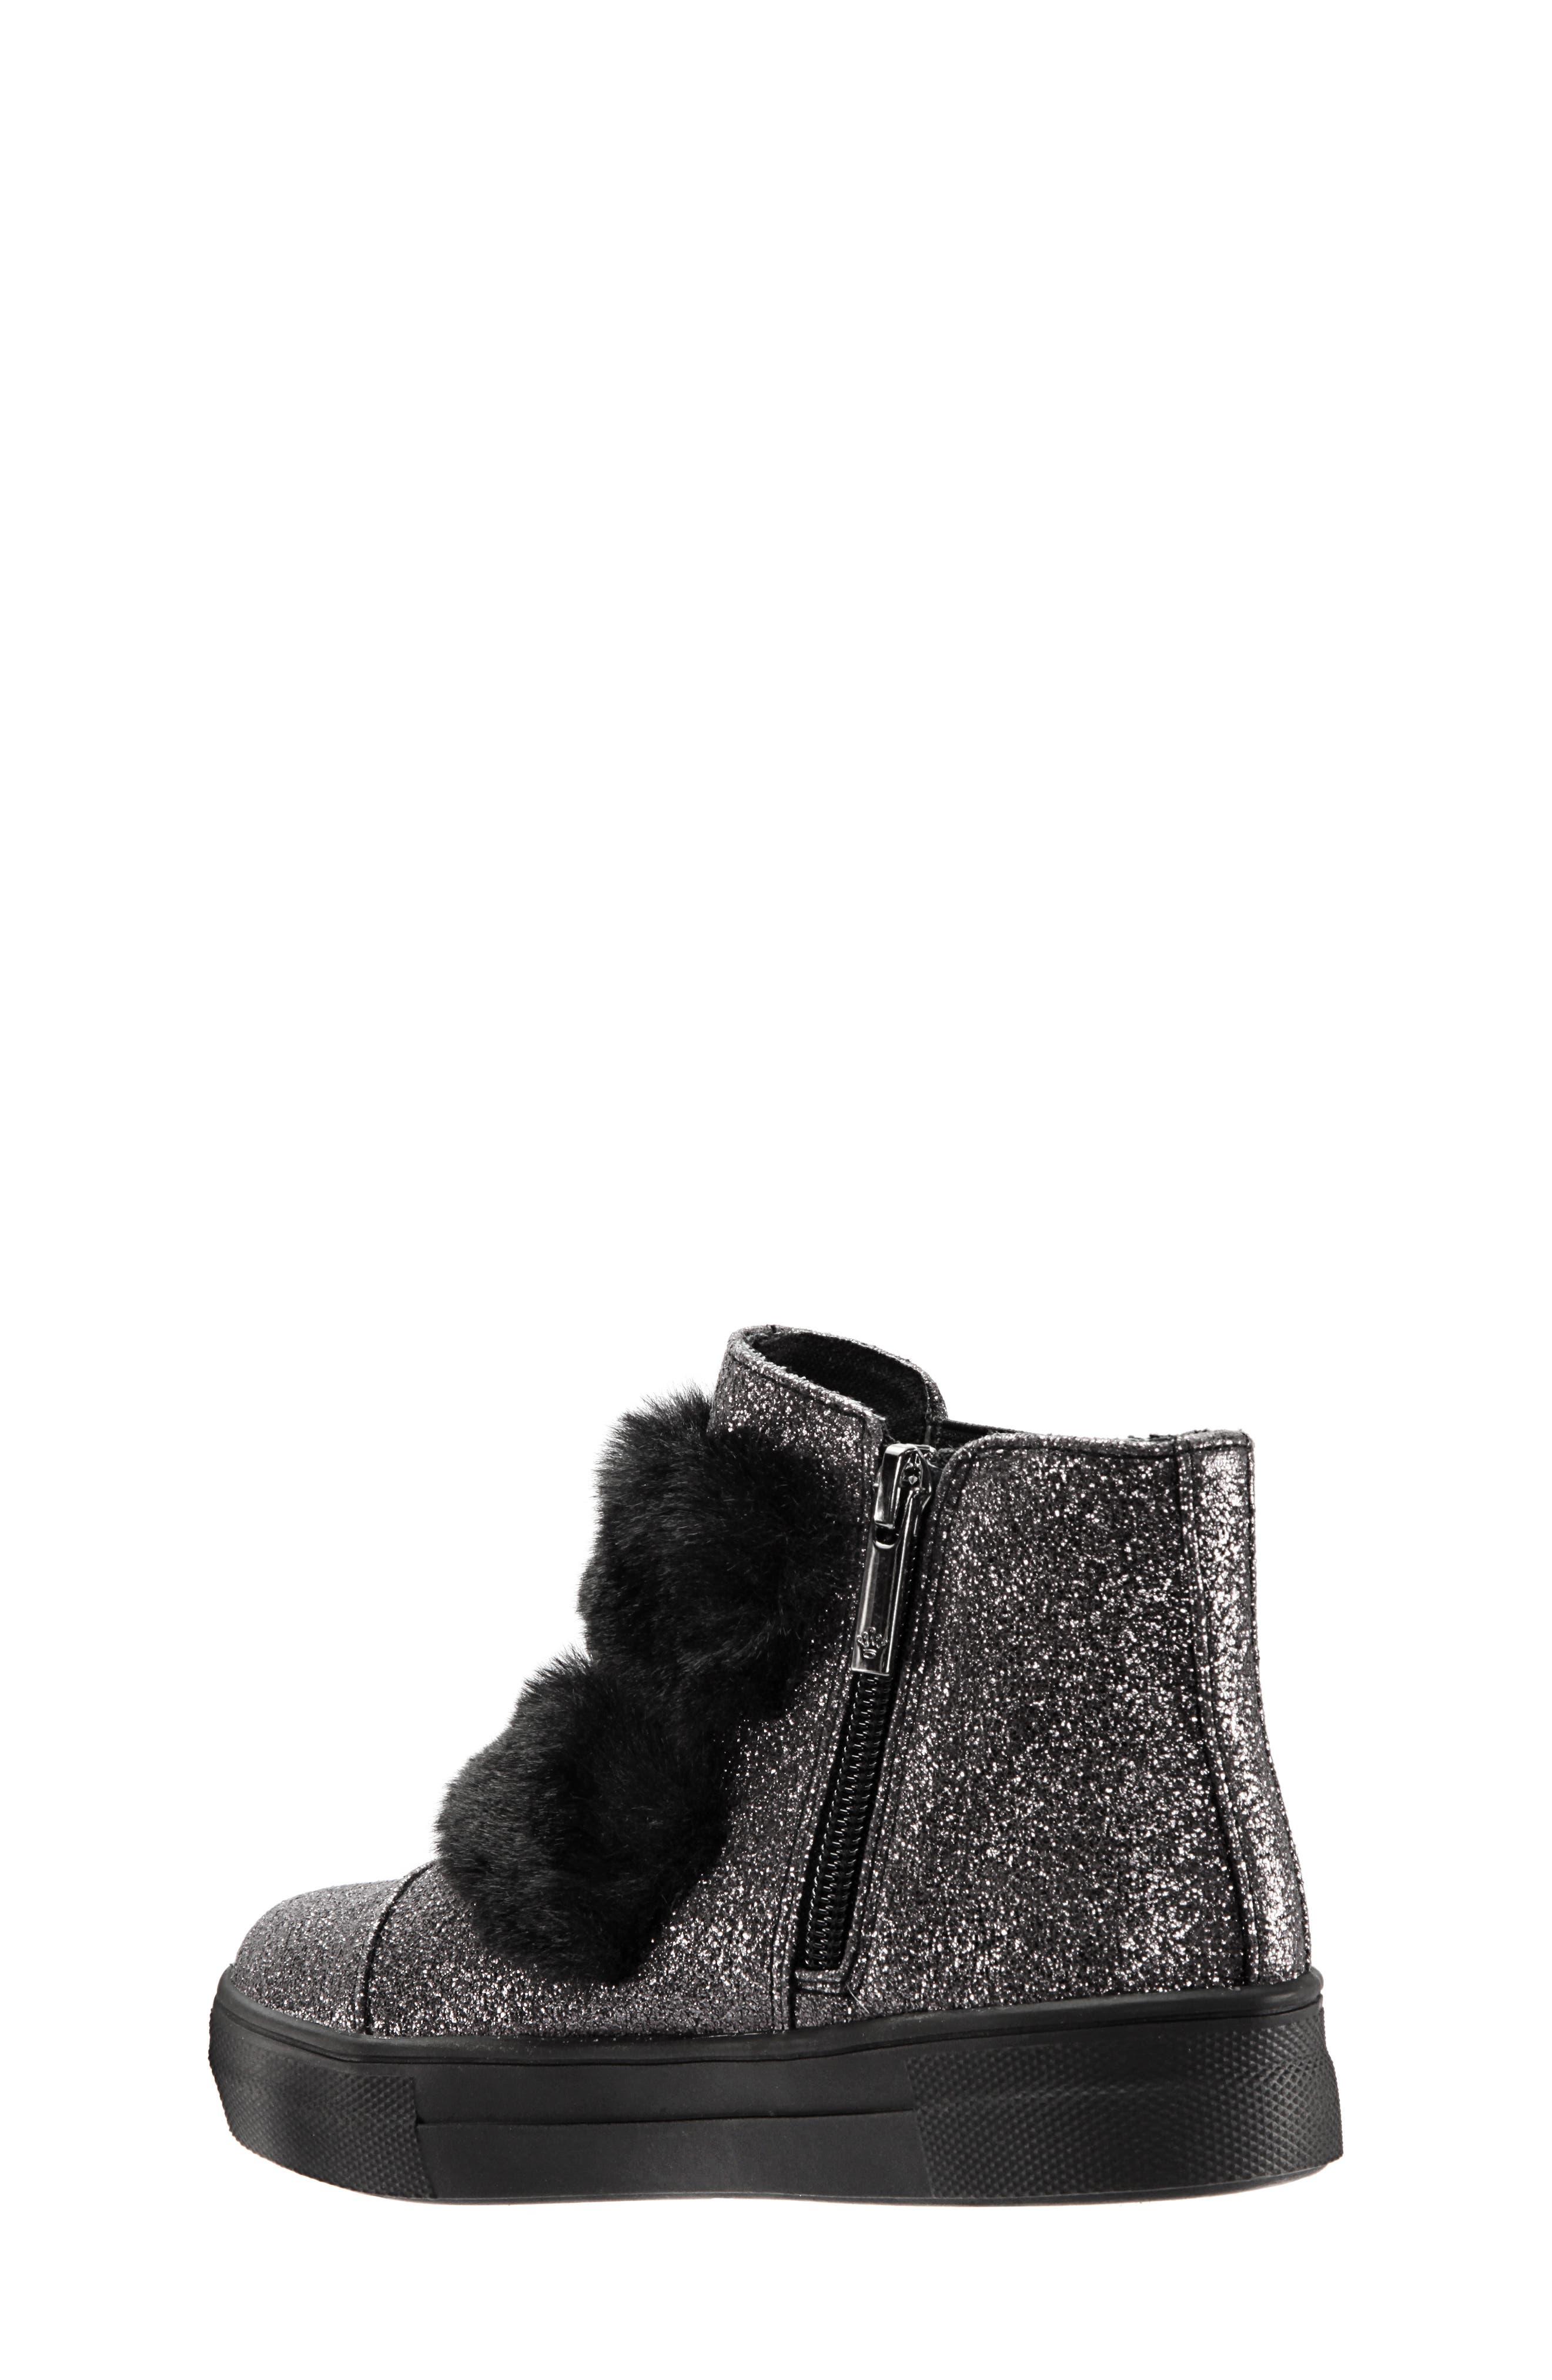 Helen Faux Fur Bootie Sneaker,                             Alternate thumbnail 2, color,                             PEWTER CRACKLE METALLIC